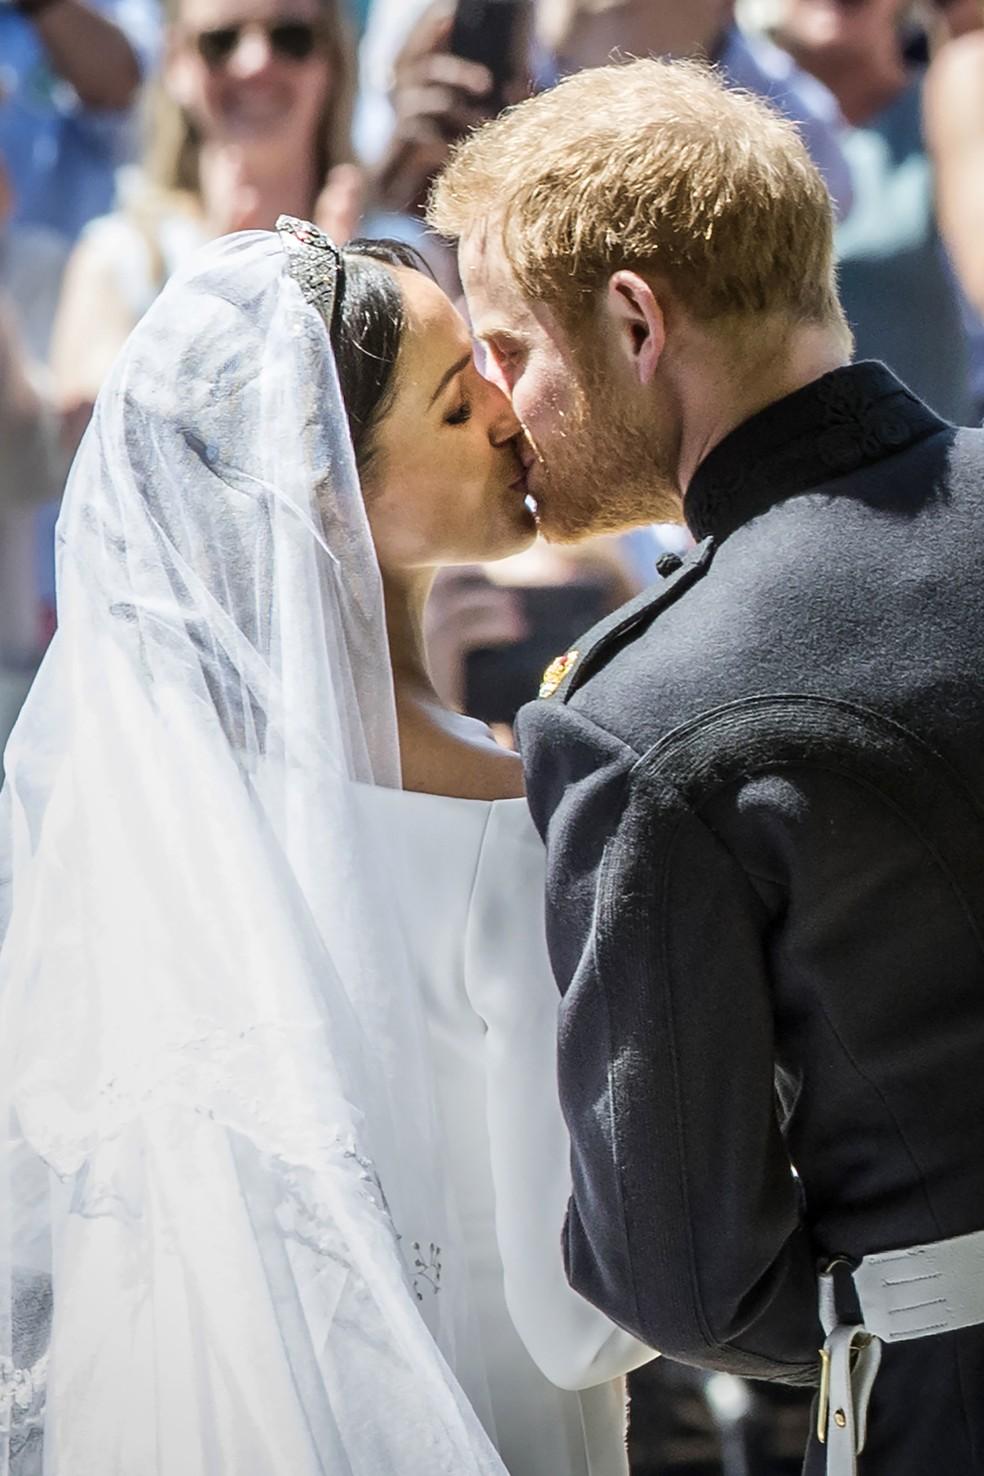 Principe Harry beija a esposa Meghan Markle (Foto: Danny Lawso/POOL/AFP)